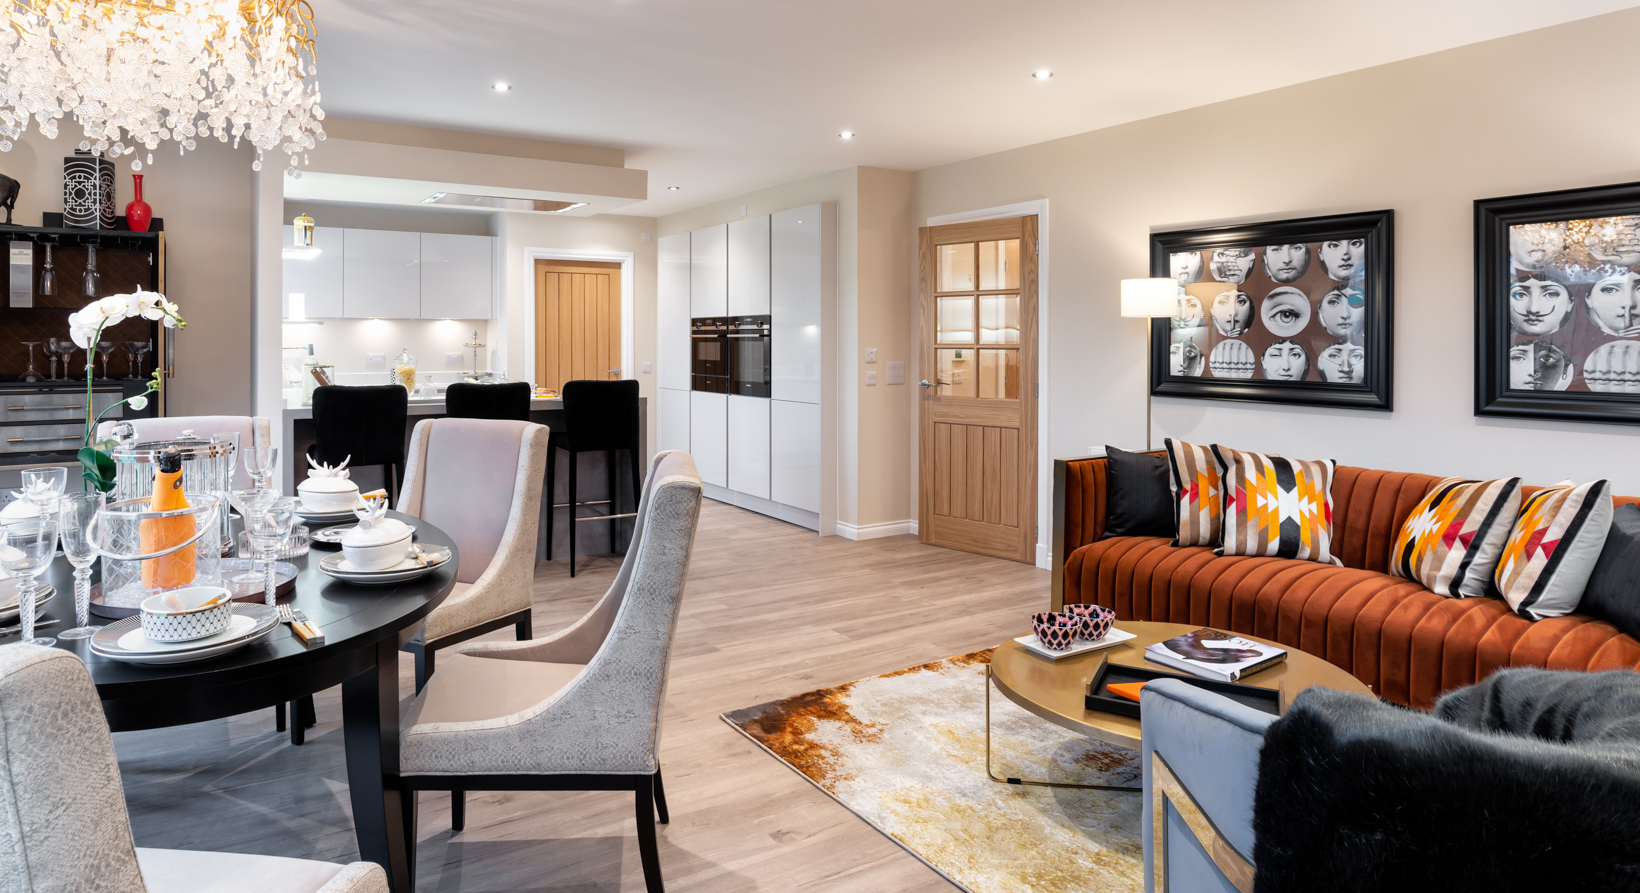 The 2021 new home wishlist